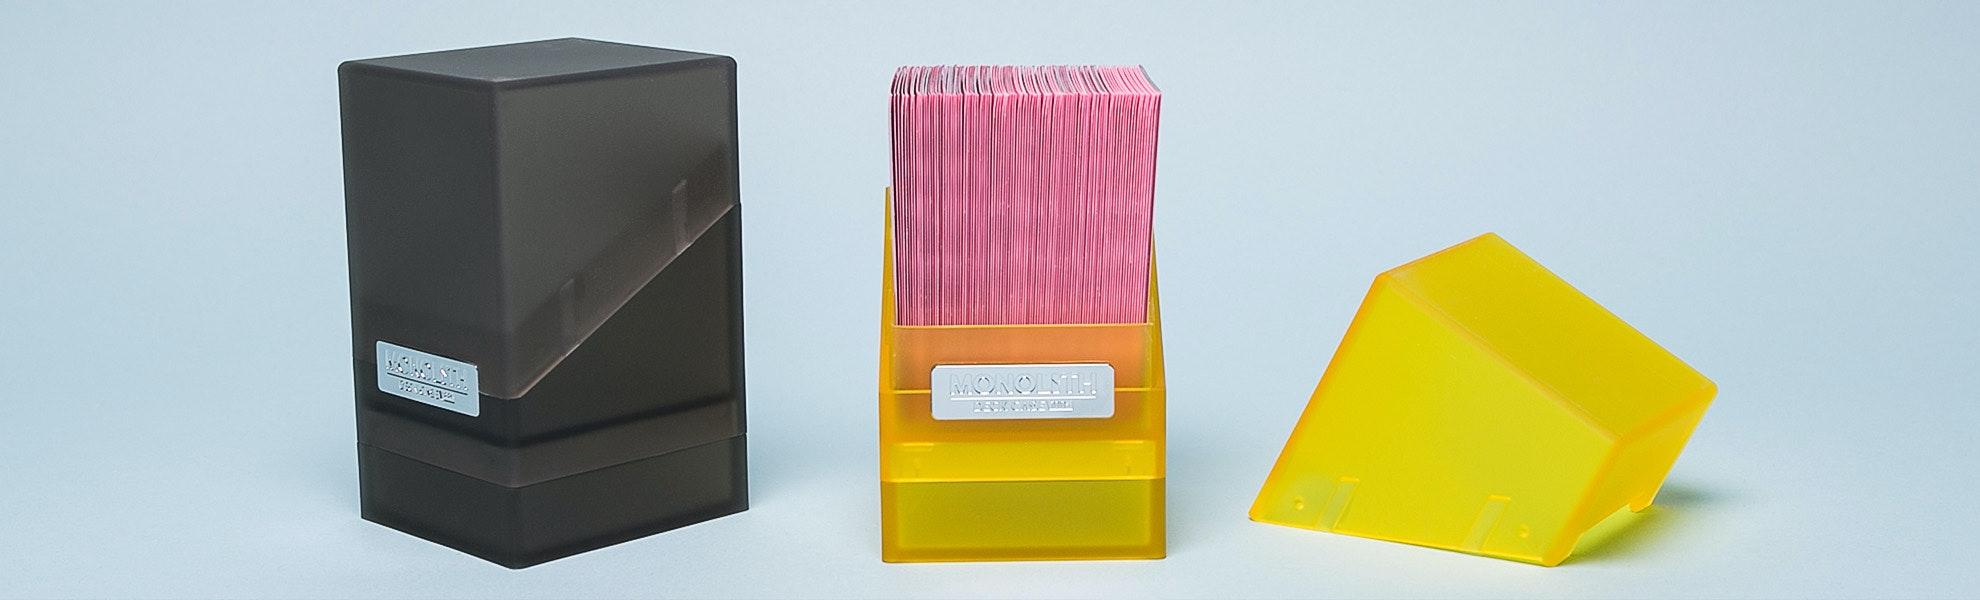 Monolith 100+ Jewel Deck Case (2-Pack)